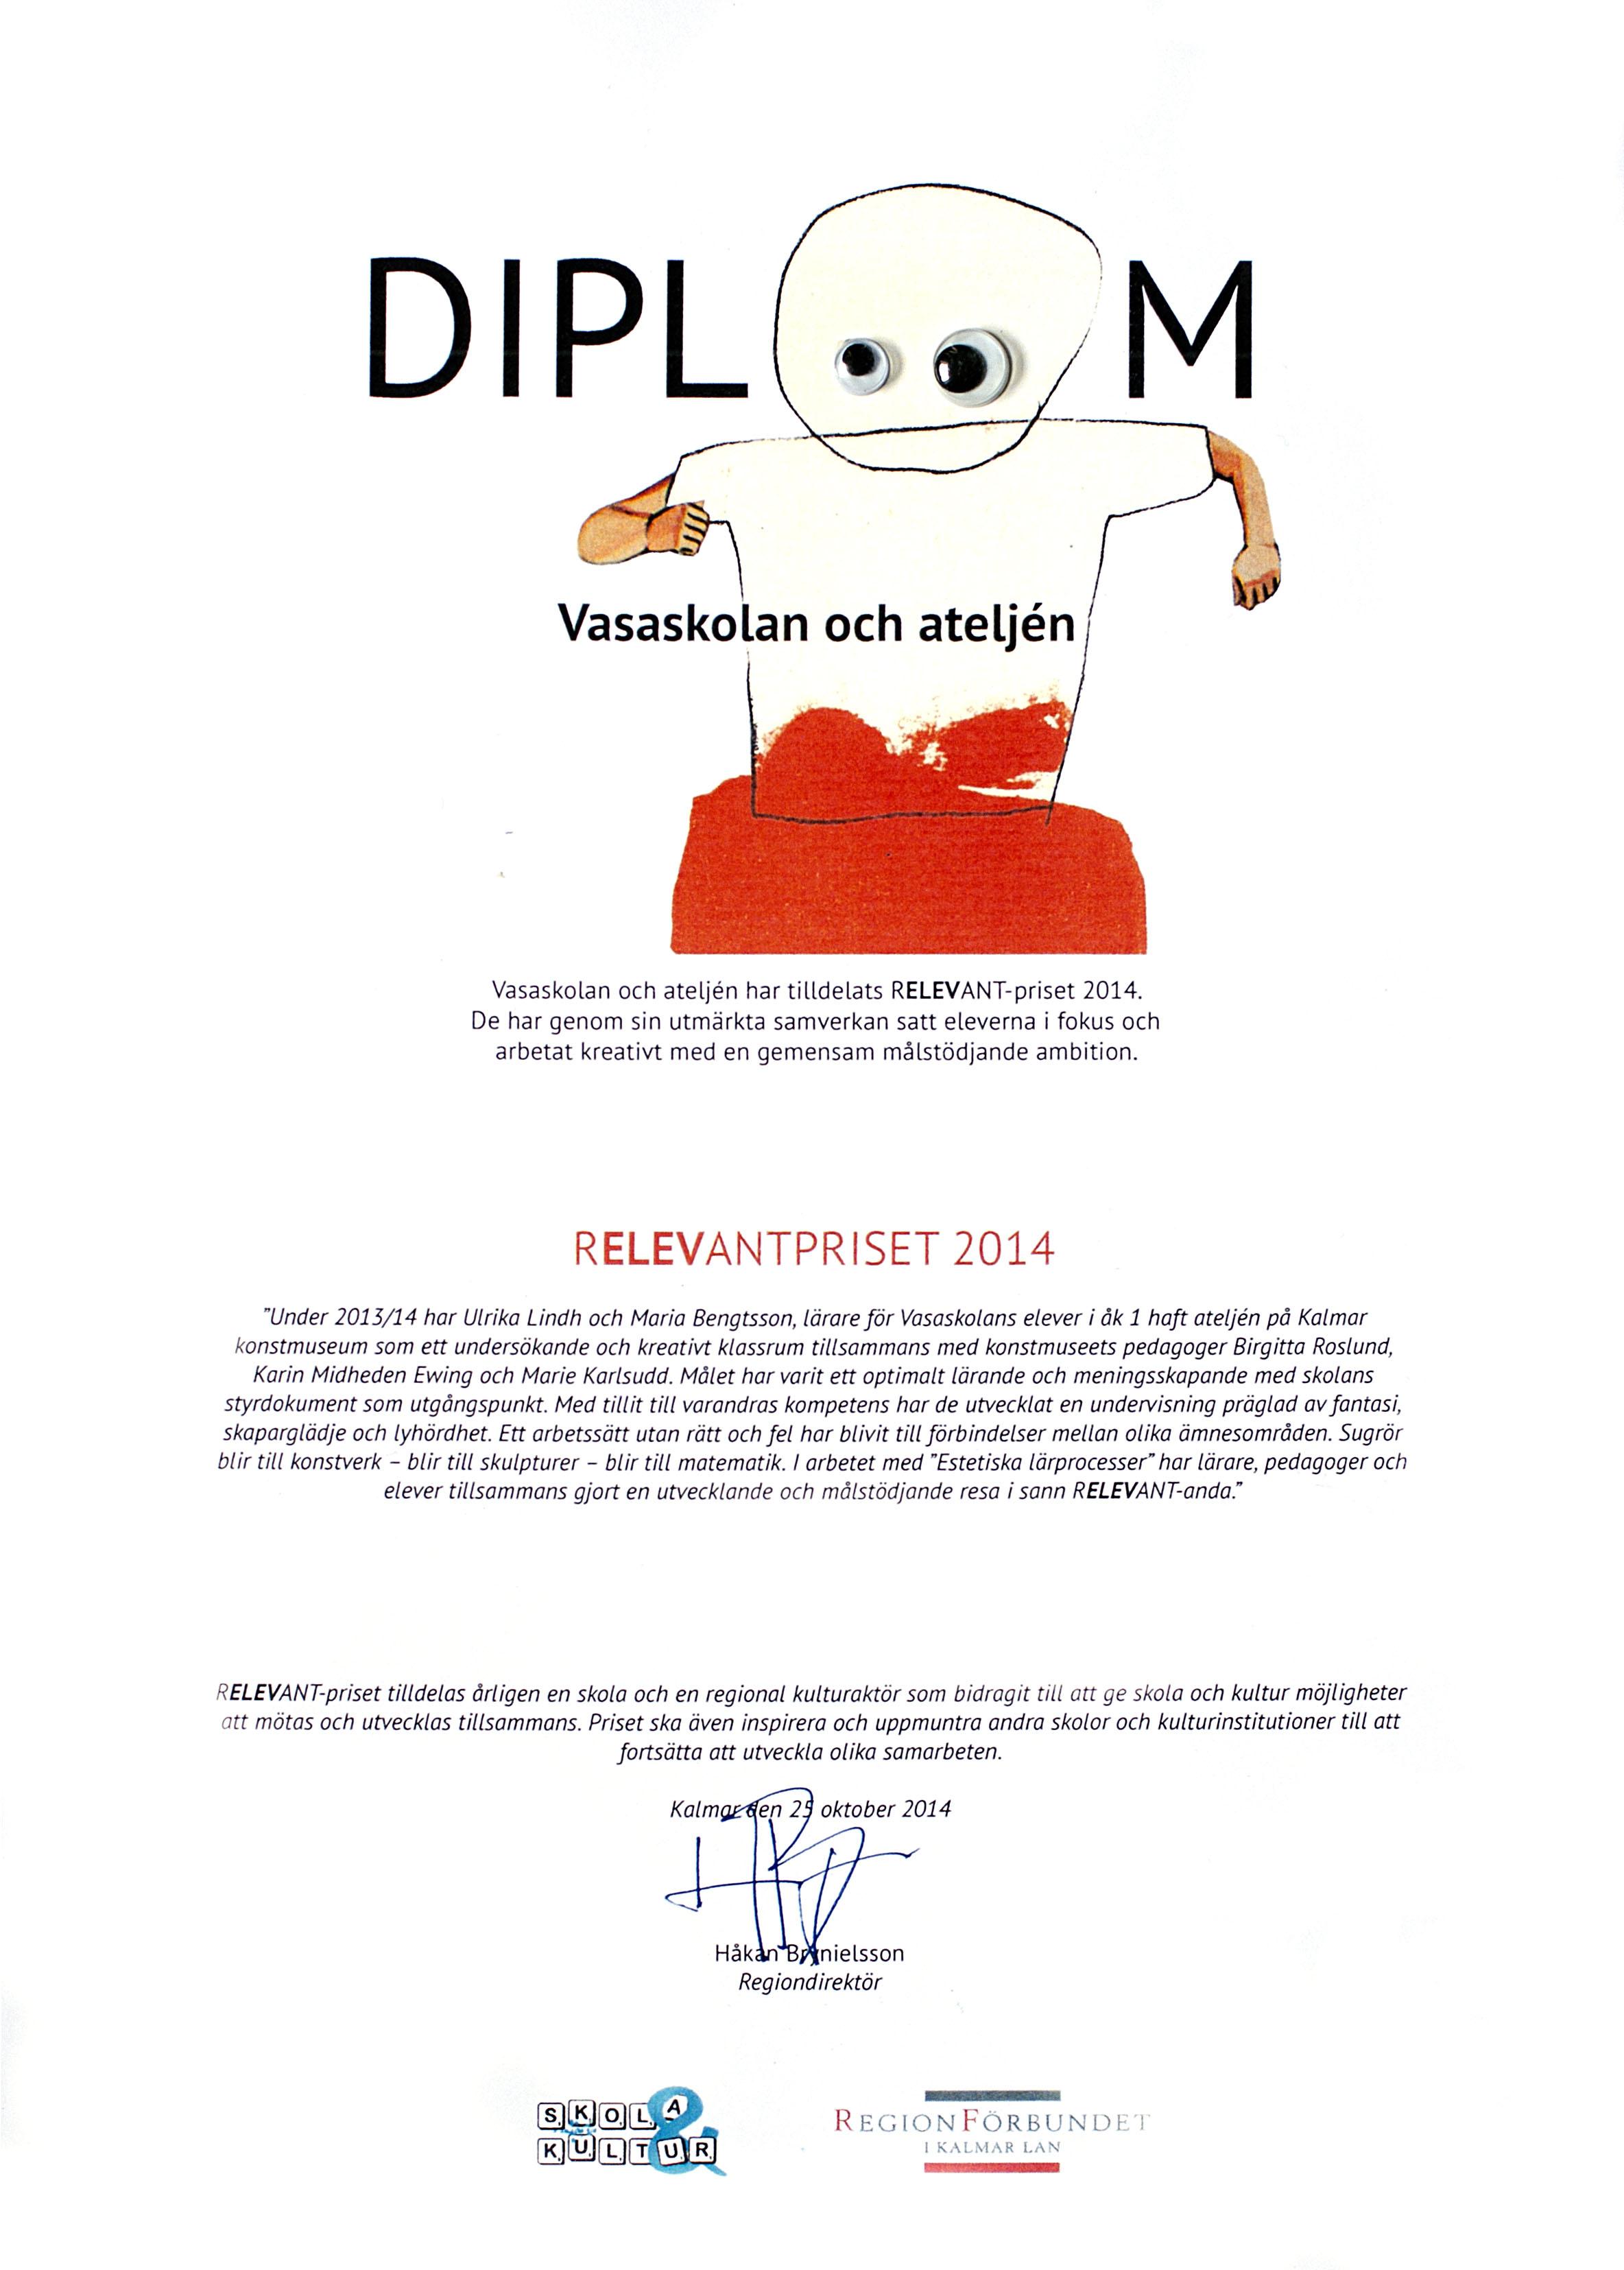 Diplom Relevantpriset 2014 till Ateljén på Kalmar konstmuseum